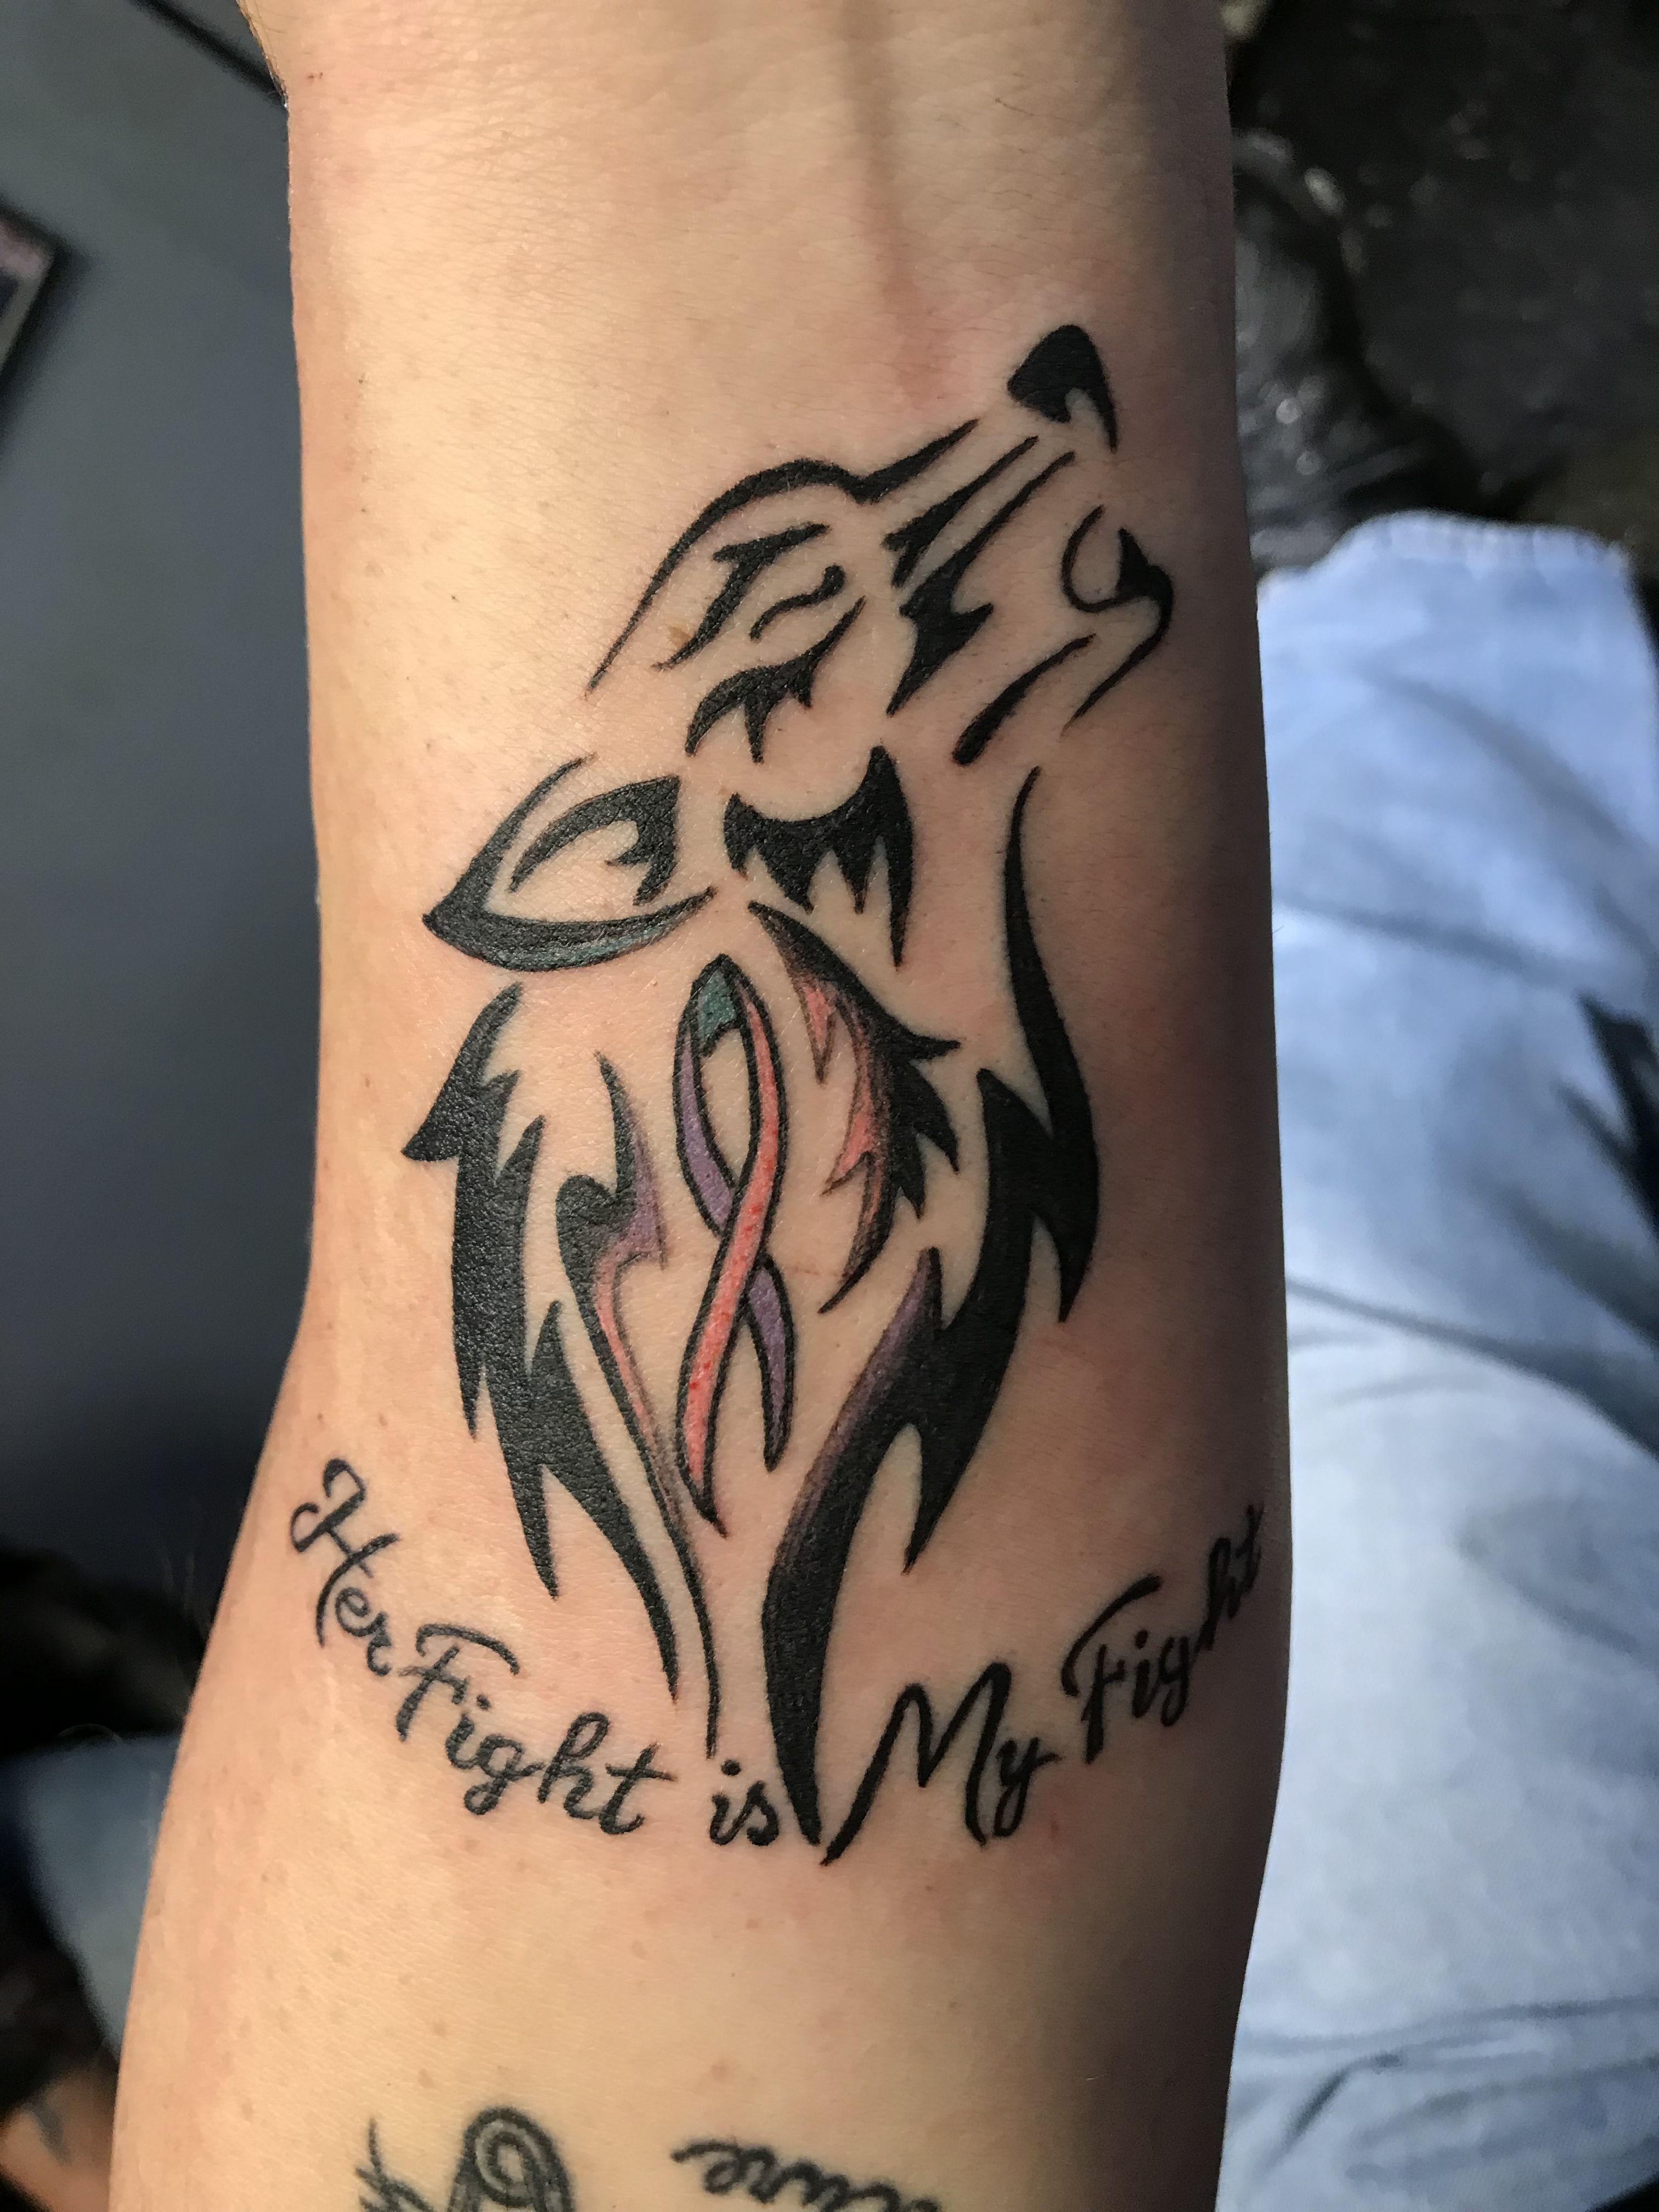 My husbands tattoo my biggest supporter tattoos s